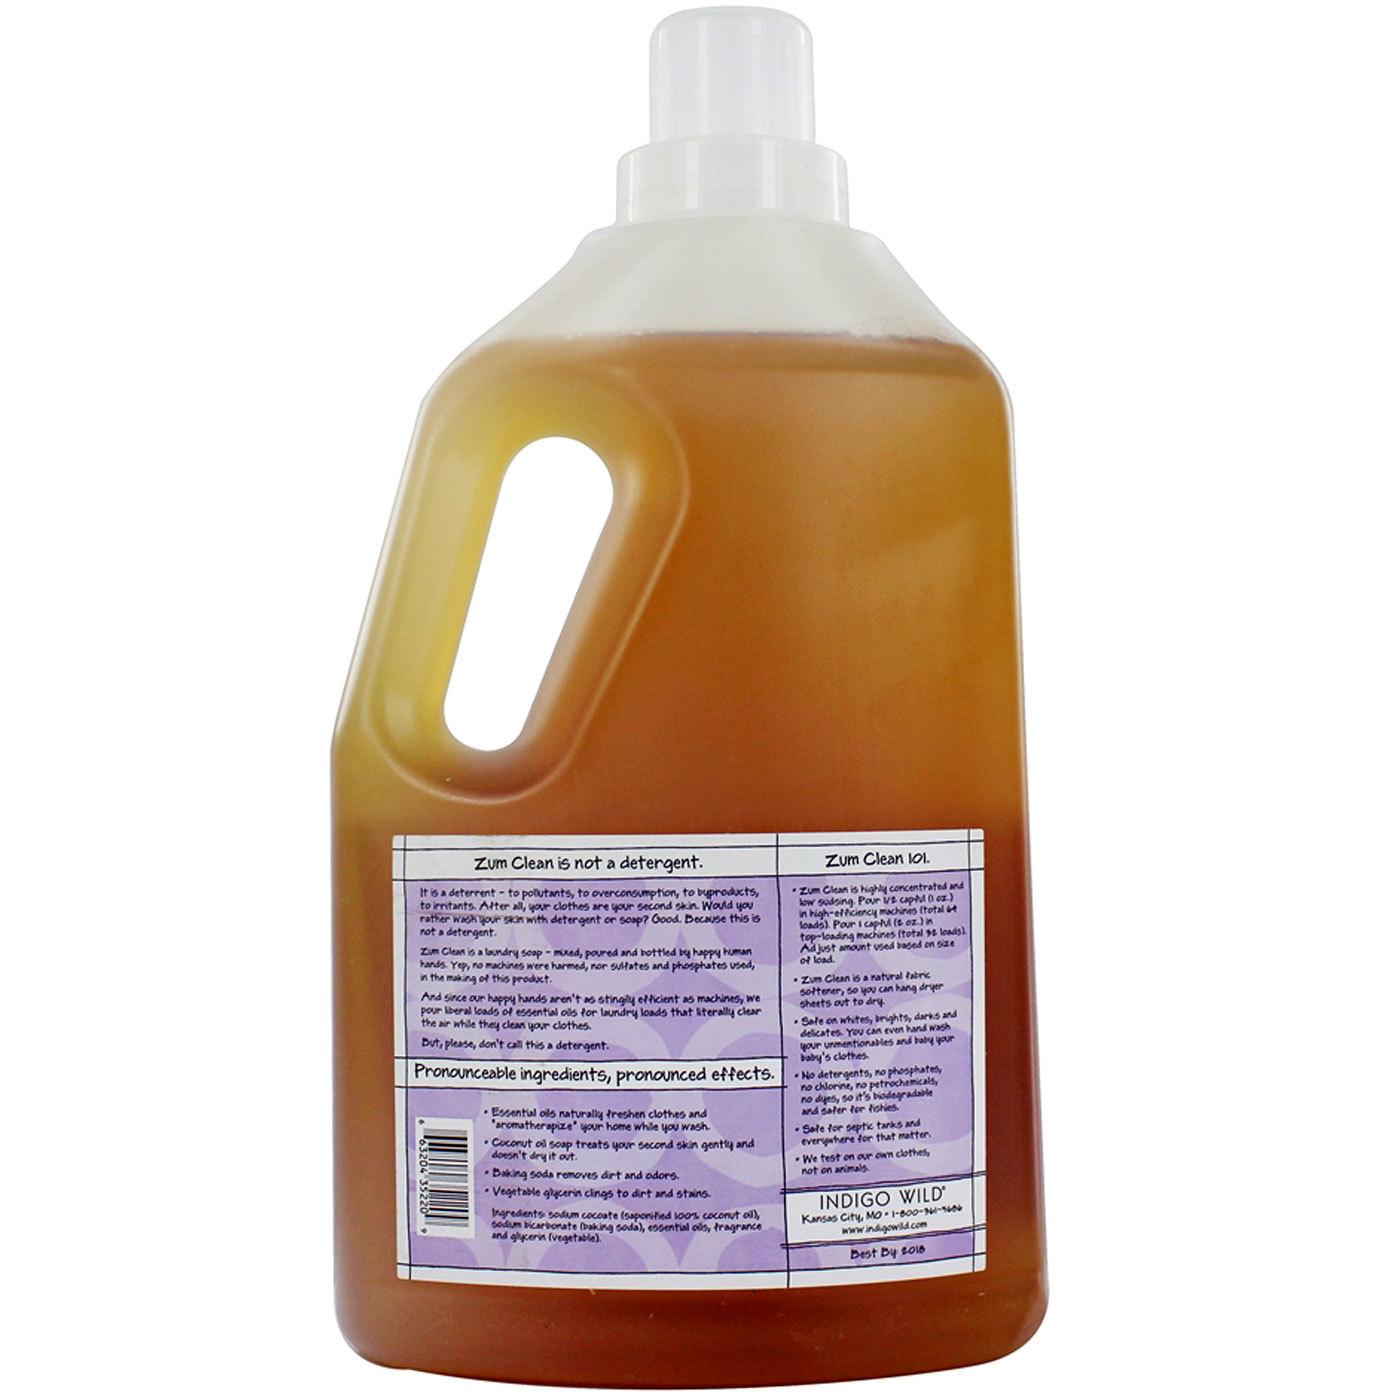 Indigo Wild Zum Clean Laundry Soap Frankincense Amp Myrrh 64 Fl Oz Evitamins Com